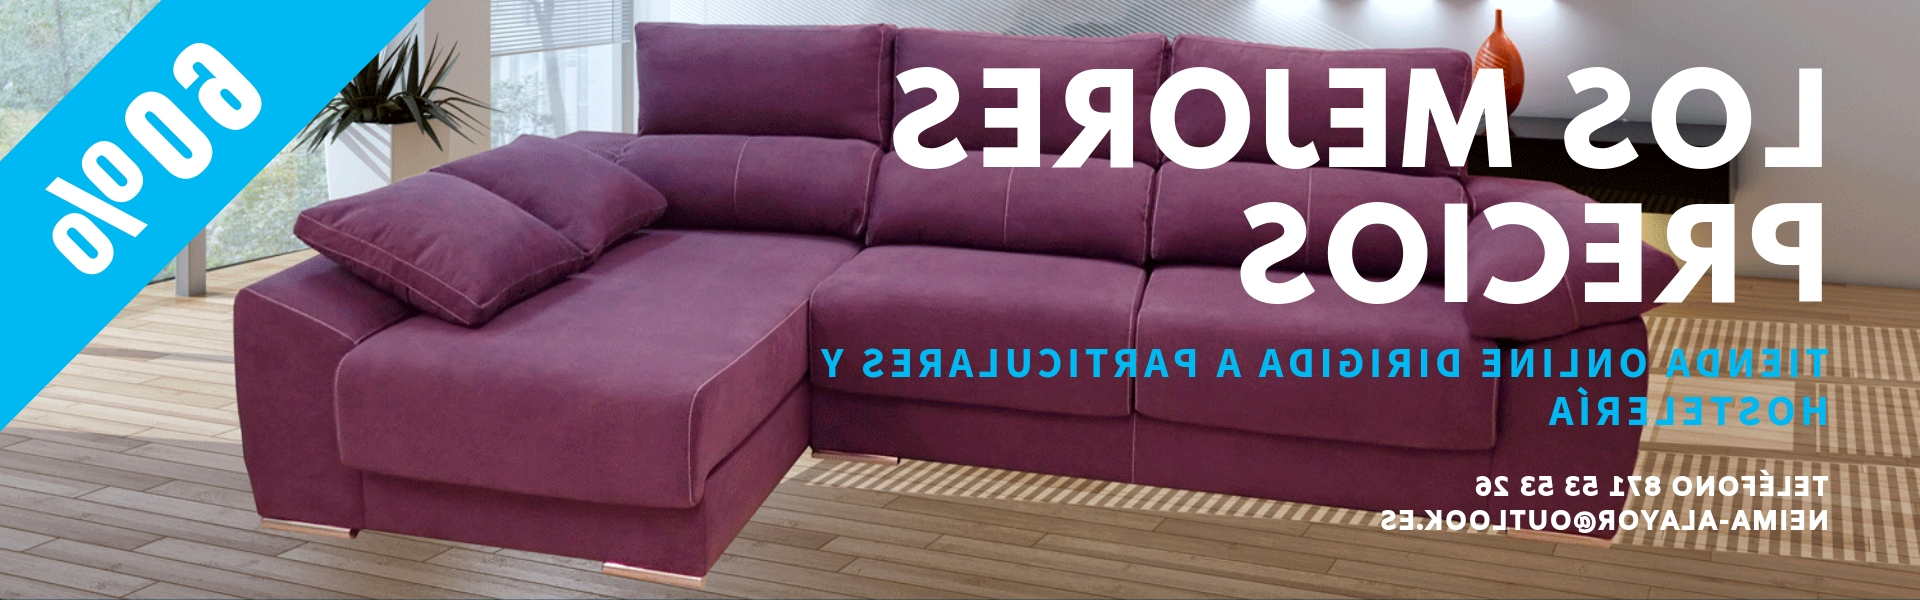 Venta De sofas Online Jxdu sofà S En Mallorca Tienda Online islas Baleares